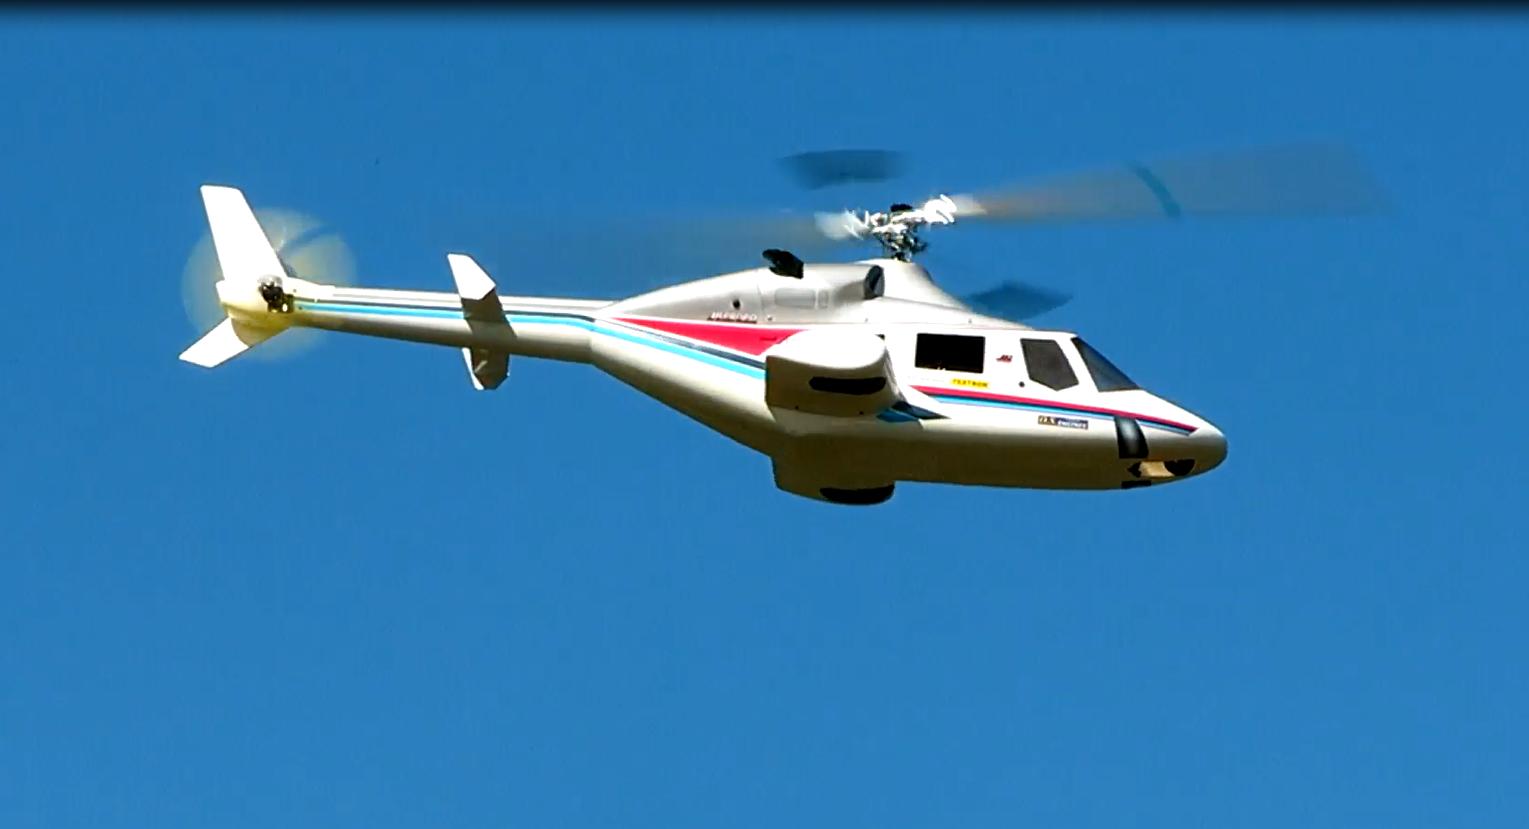 JR Bell430